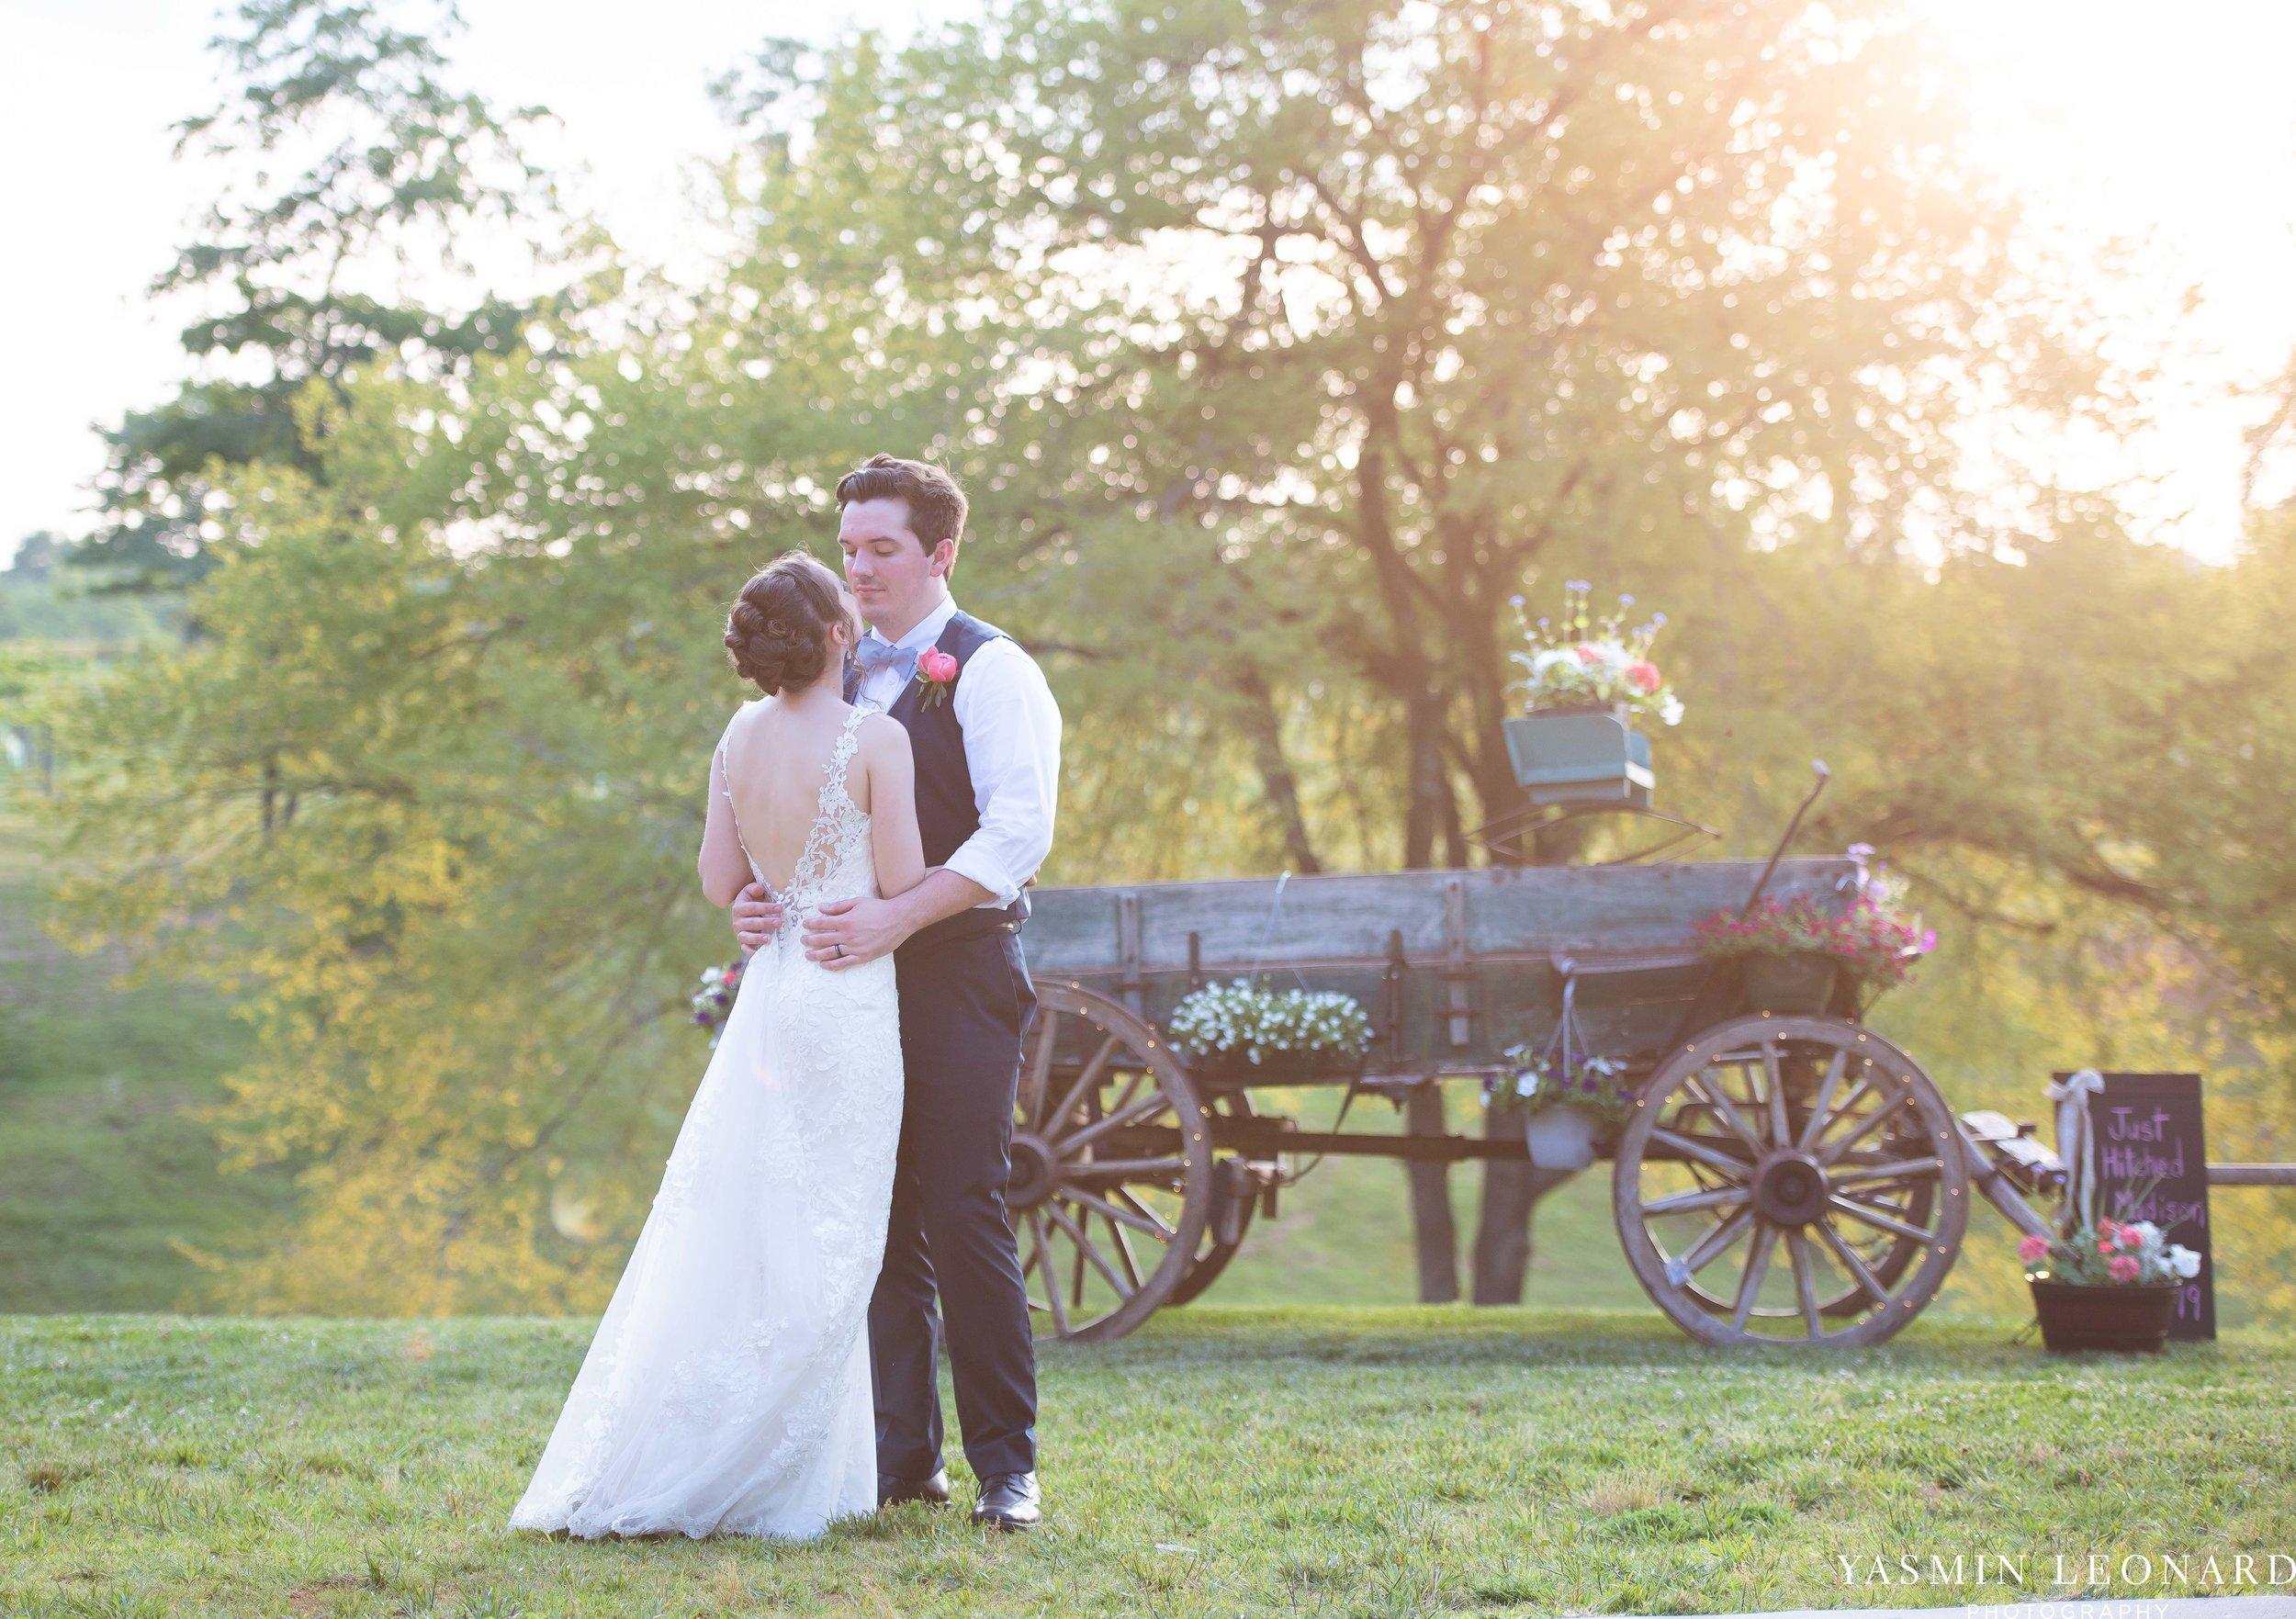 Old Homeplace Vineyard - NC Weddings - Outdoor Summer Weddings - Peony Boutique - Vineyard Wedding - NC Photographer - Yasmin Leonard Photography-58.jpg